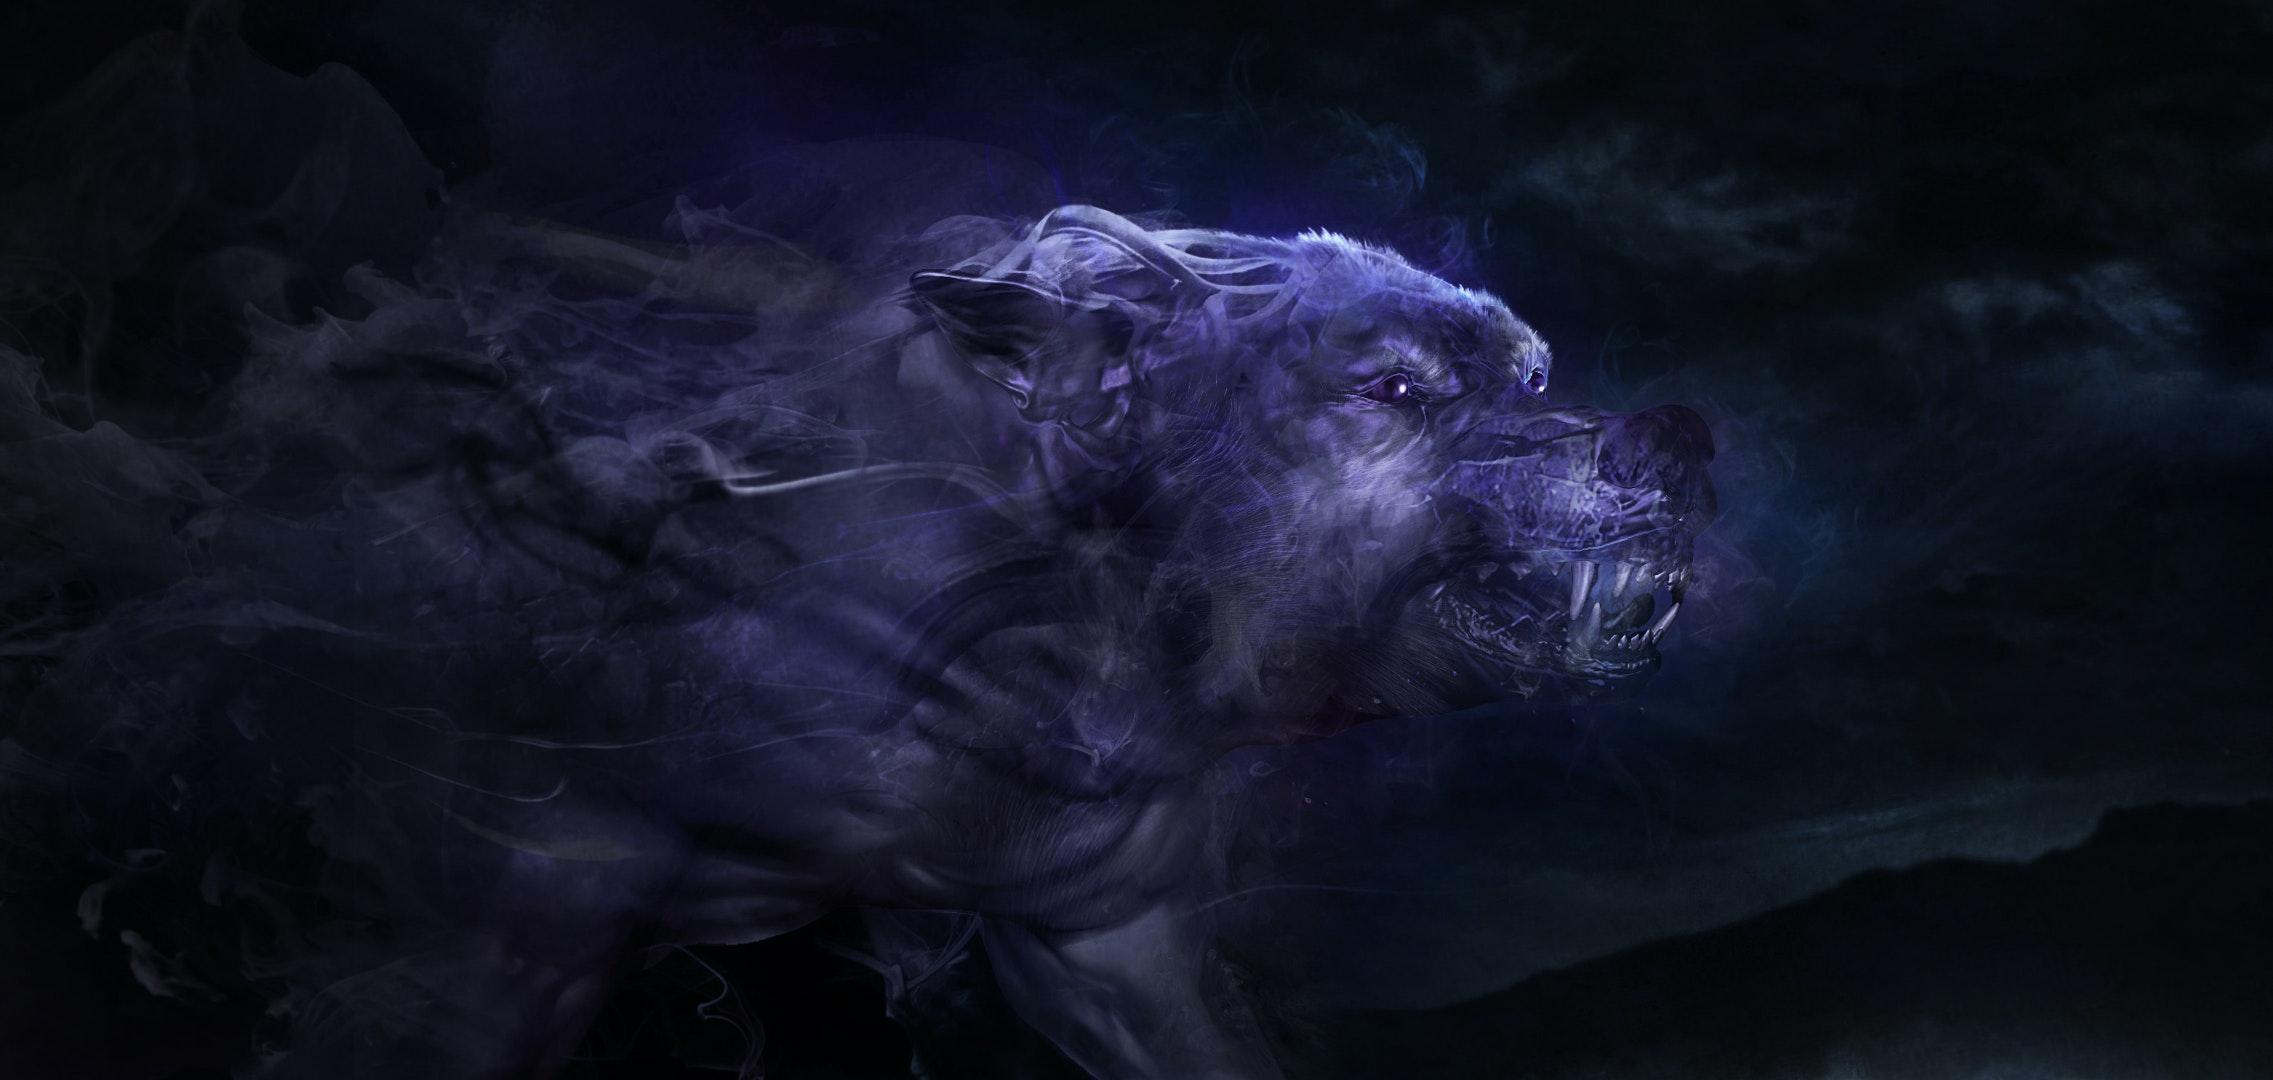 VINICIUS NALDI - Europe_Wolf_Frame1_V15